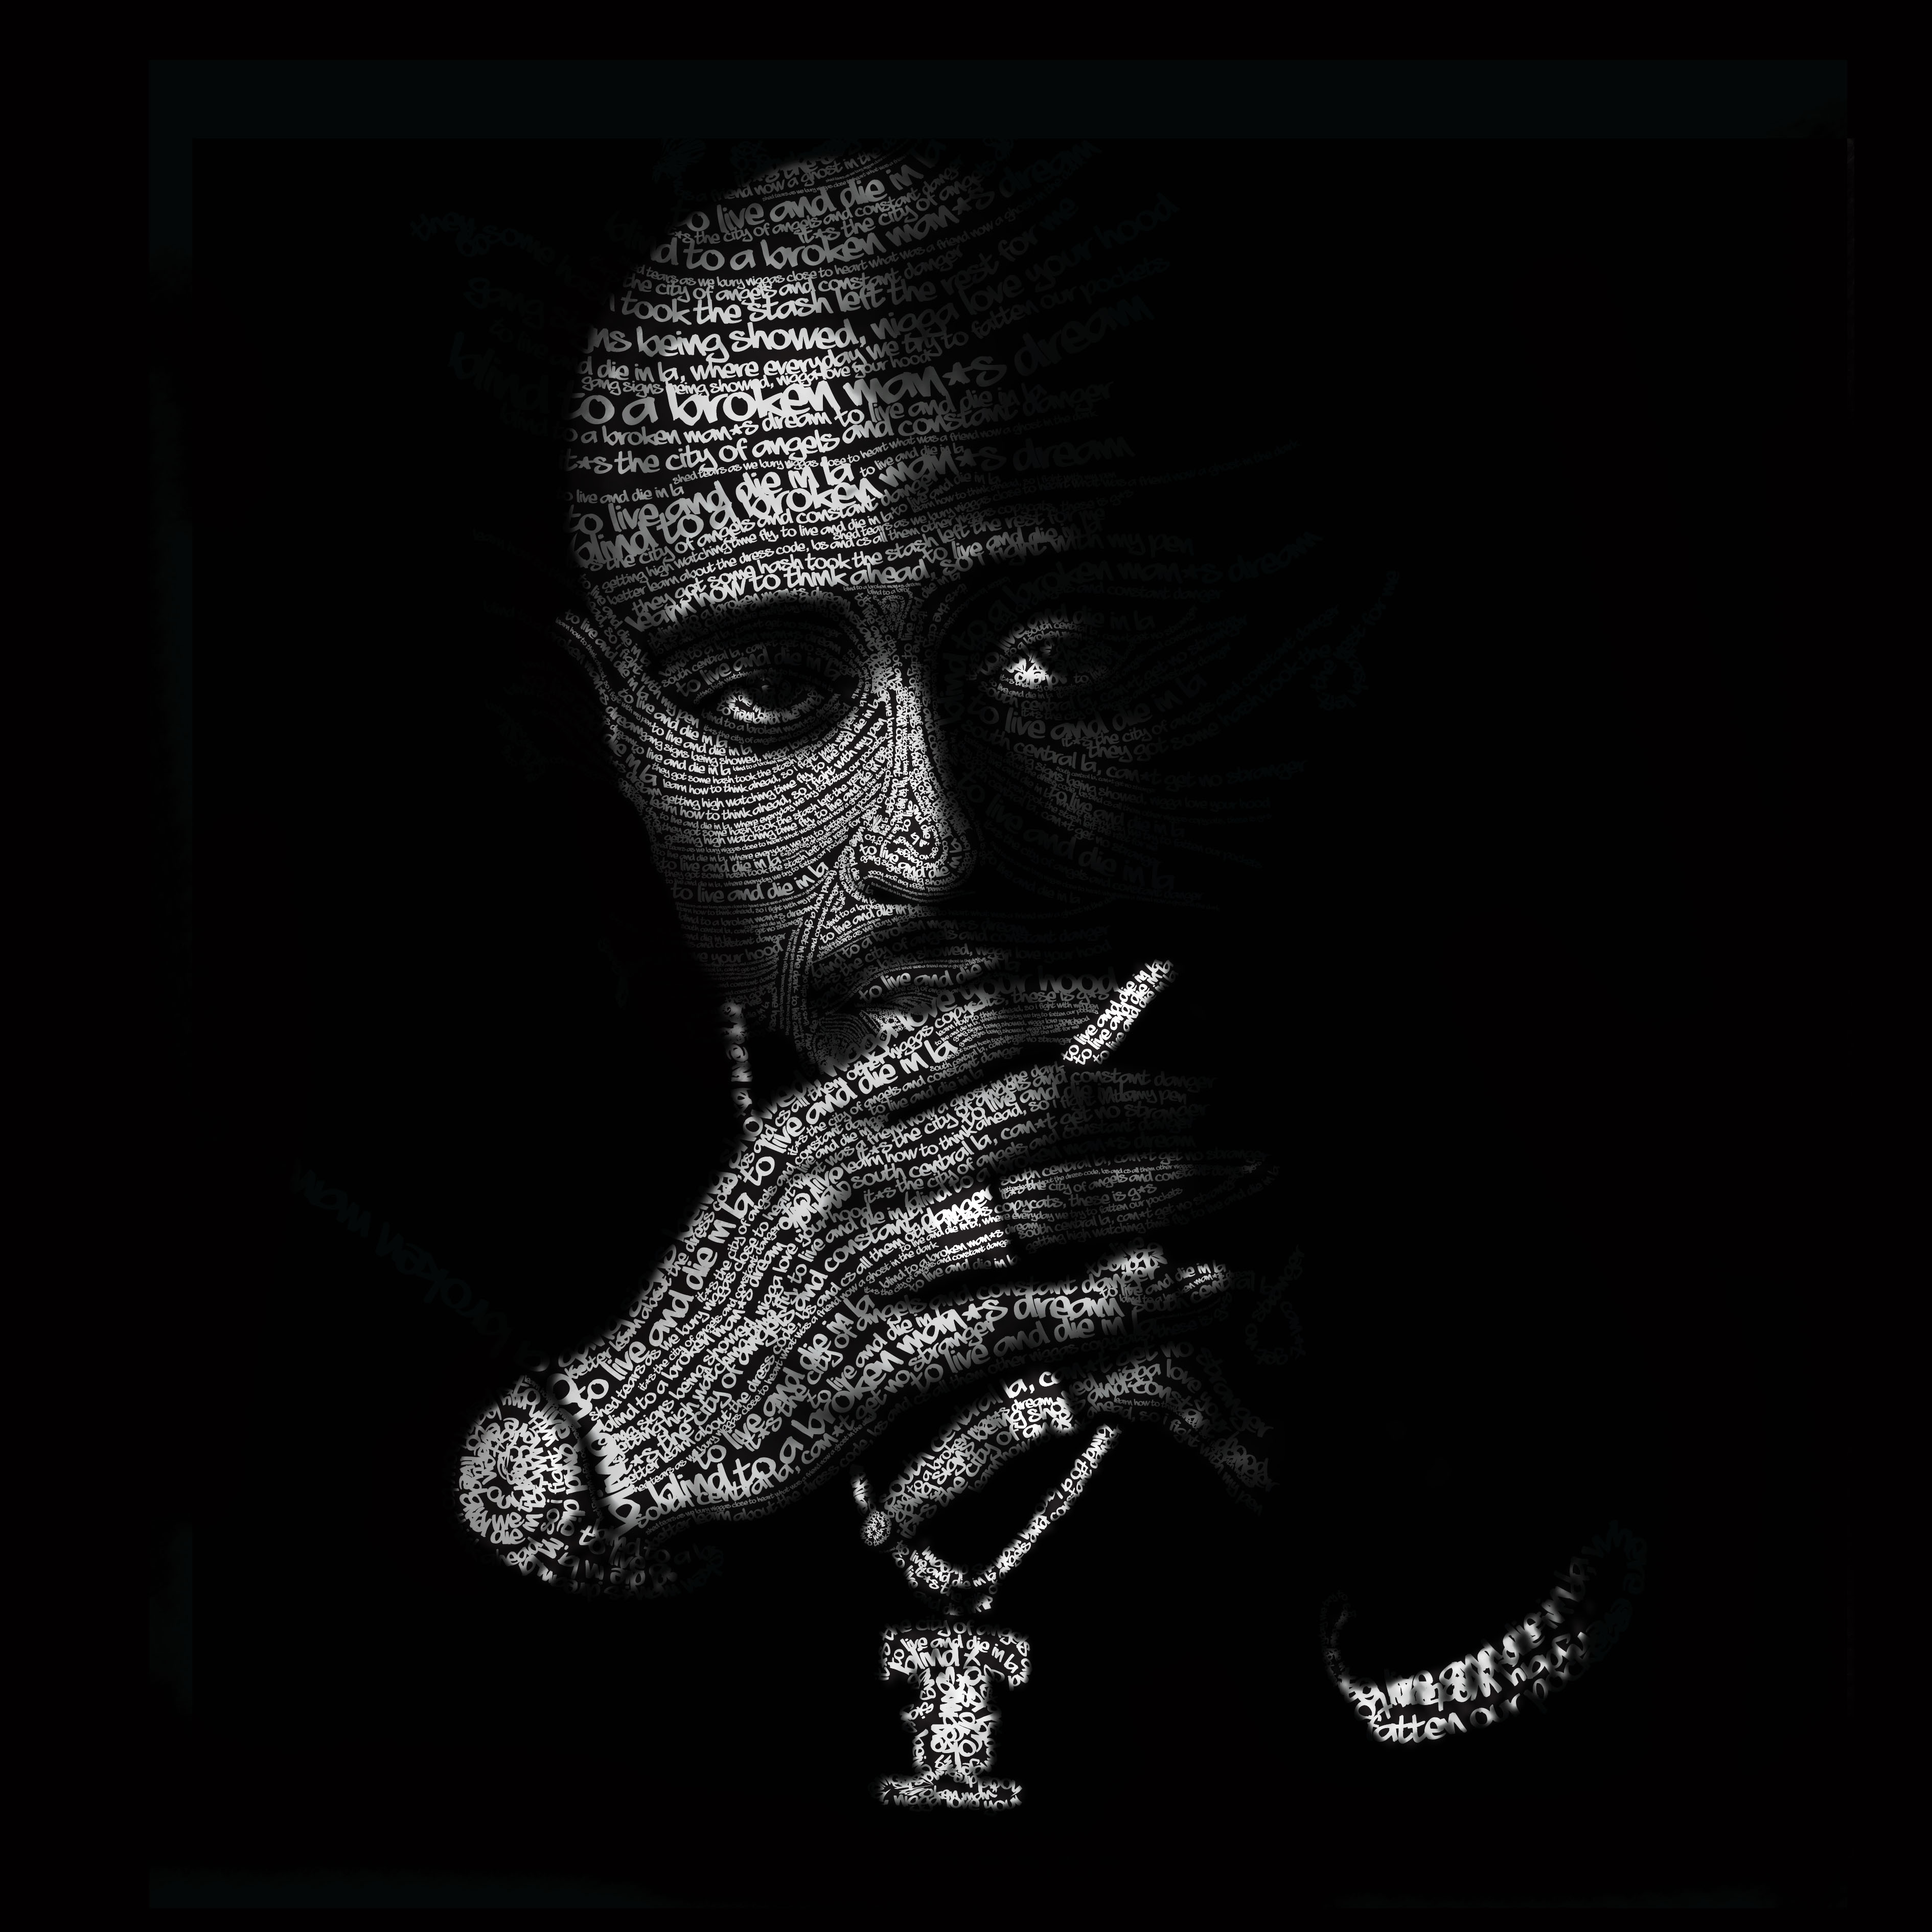 Tupac, Makaveli By Raw-truth On DeviantArt